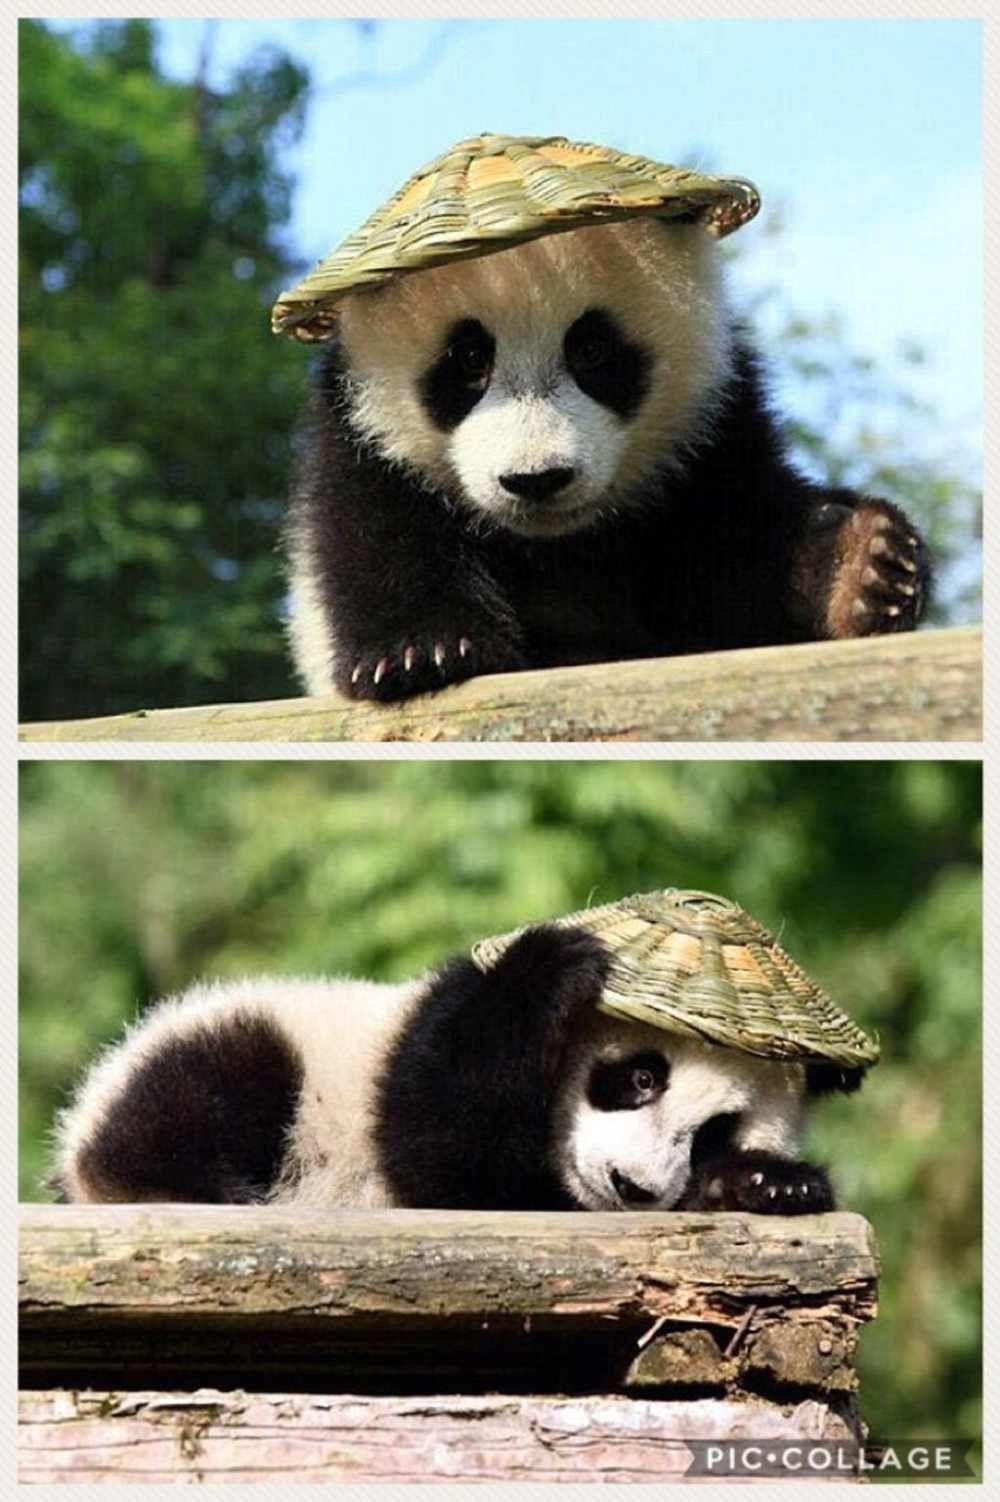 Pin de Lisa Nault en PANDAS!!!!!!!!! | Pinterest | Osos, Animales y ...